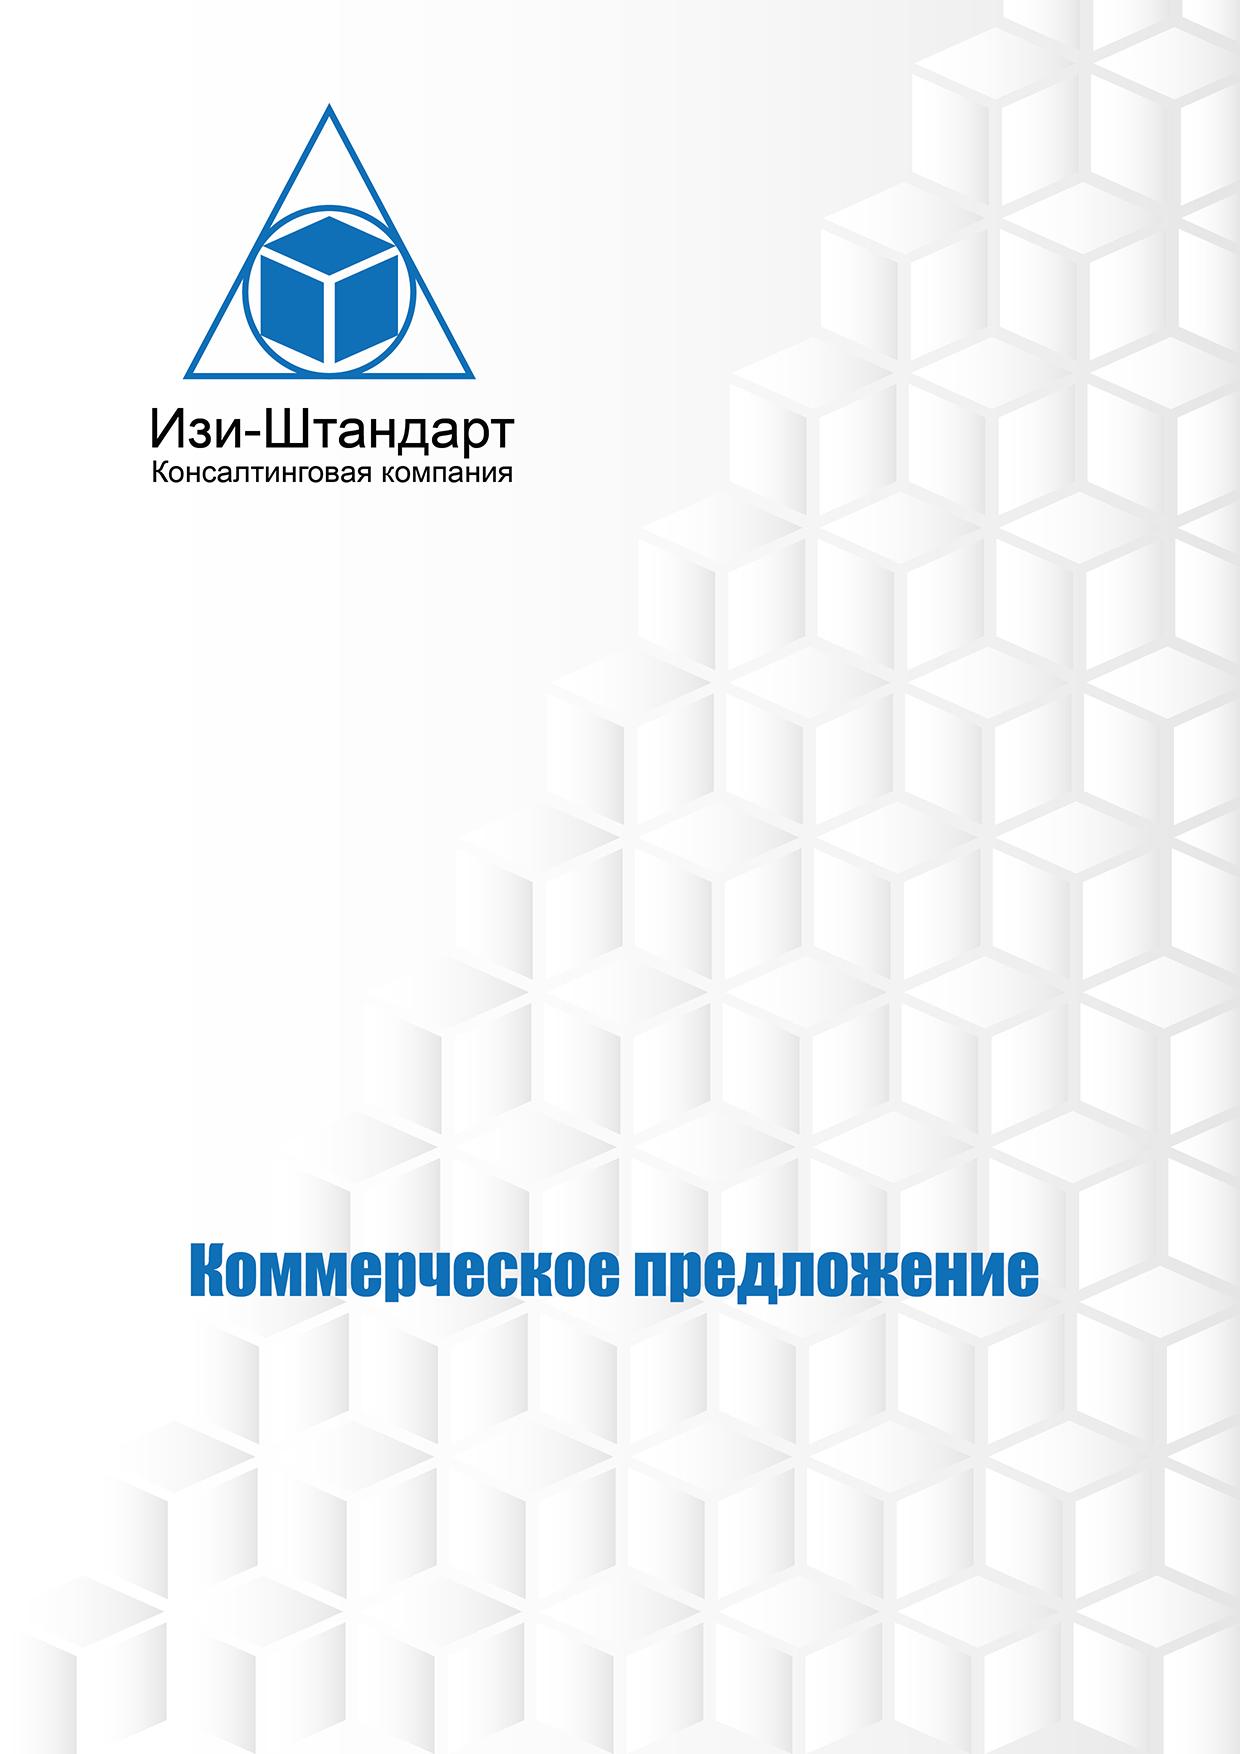 Оформление фирменных документов фото f_3965943f37daf8c4.jpg